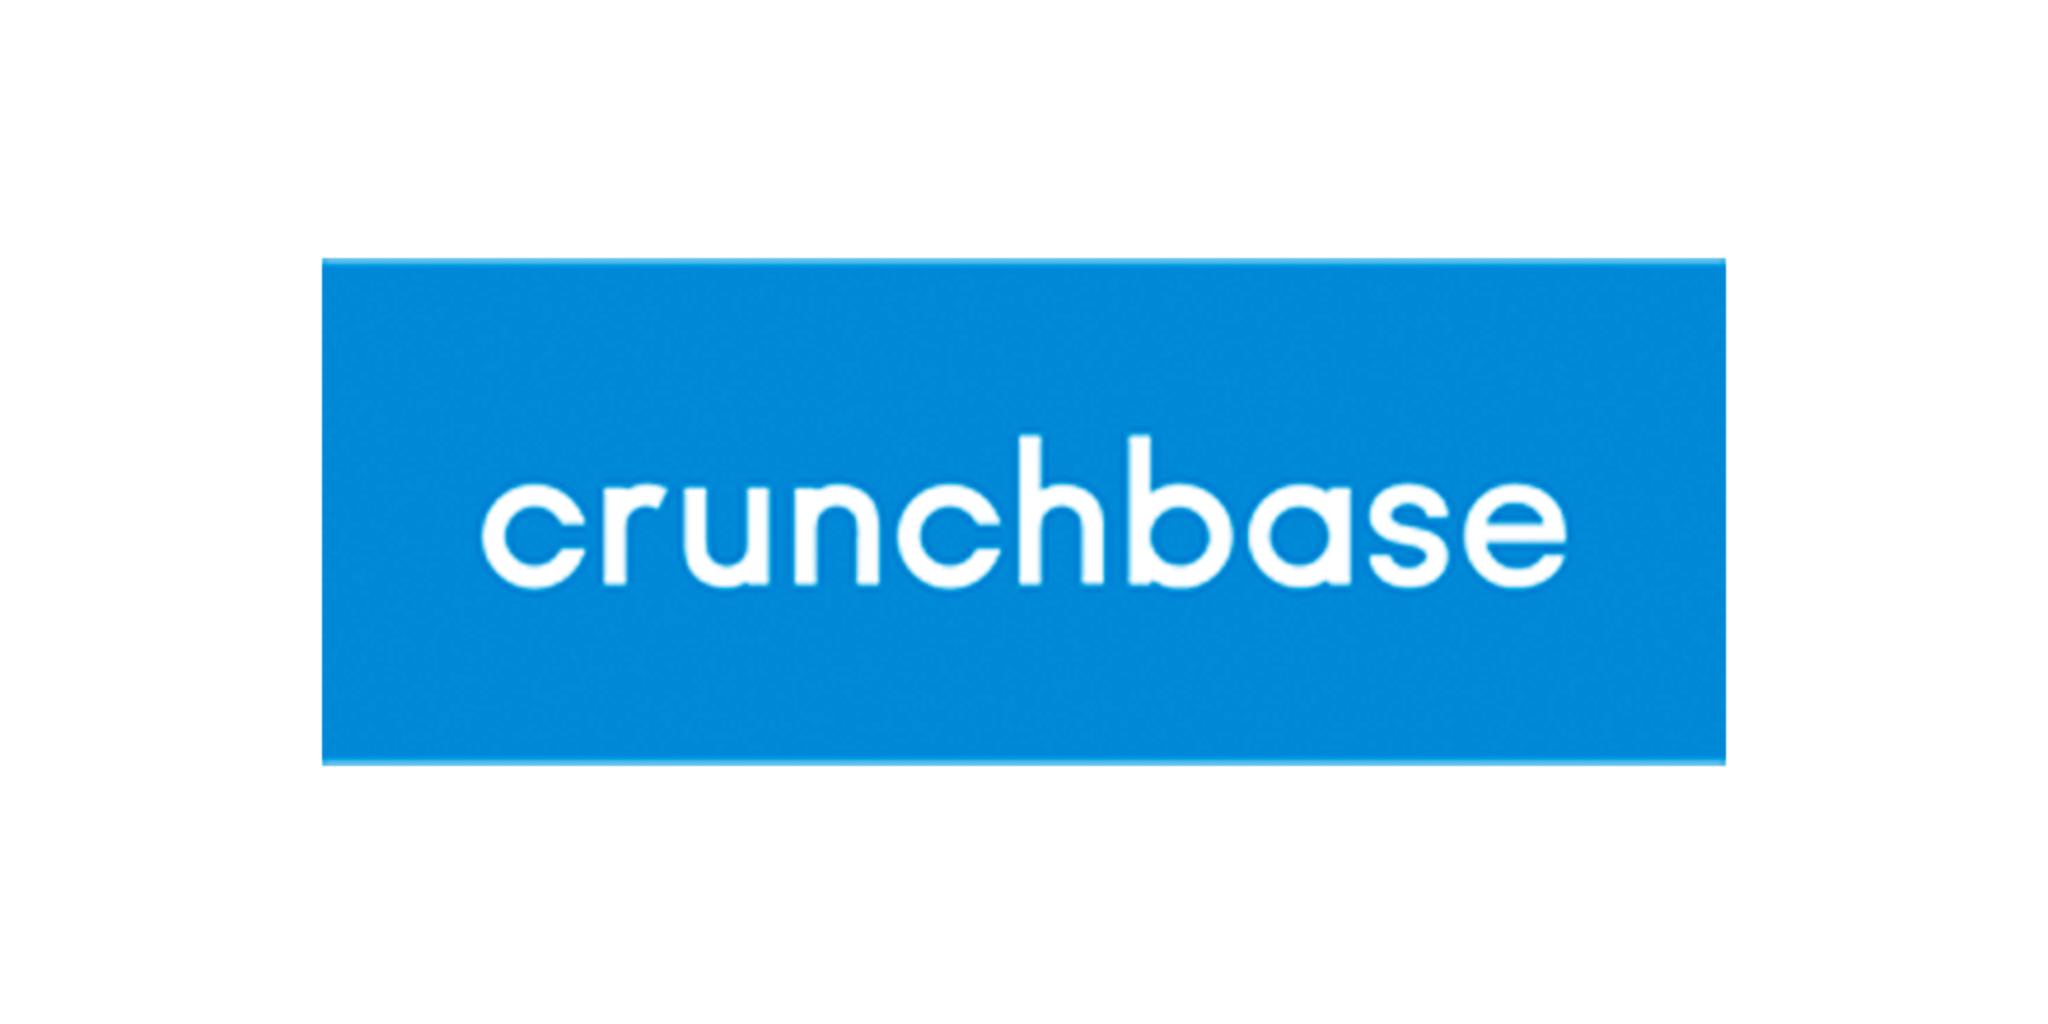 Image of Press crunchbase logo